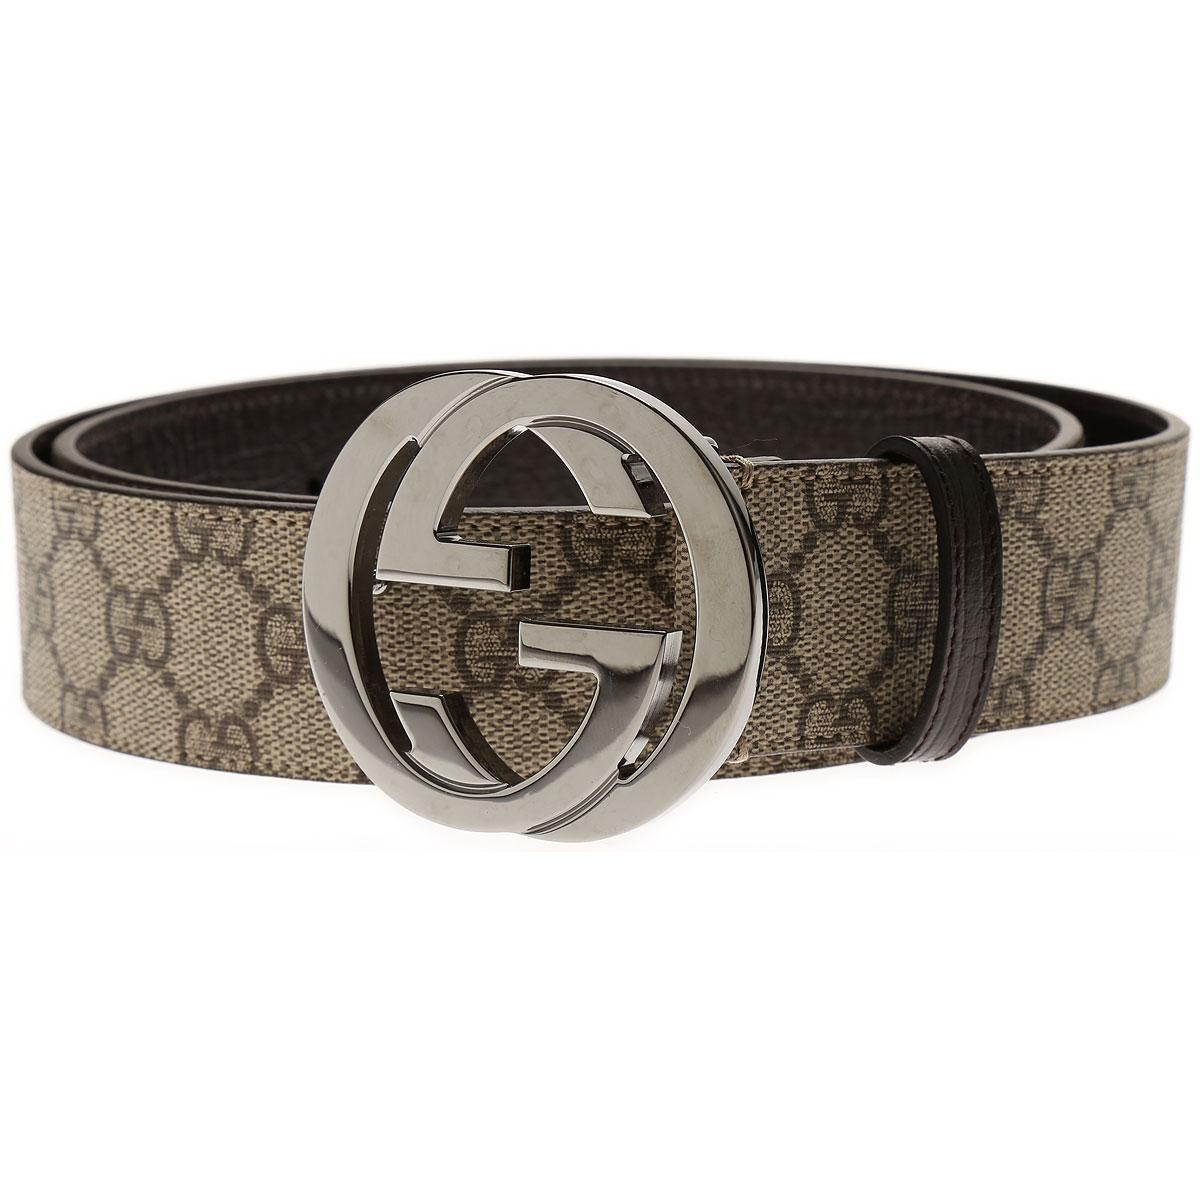 c2c4ddf7b Mens Belts Gucci, Style code: 114984-f069r-9643